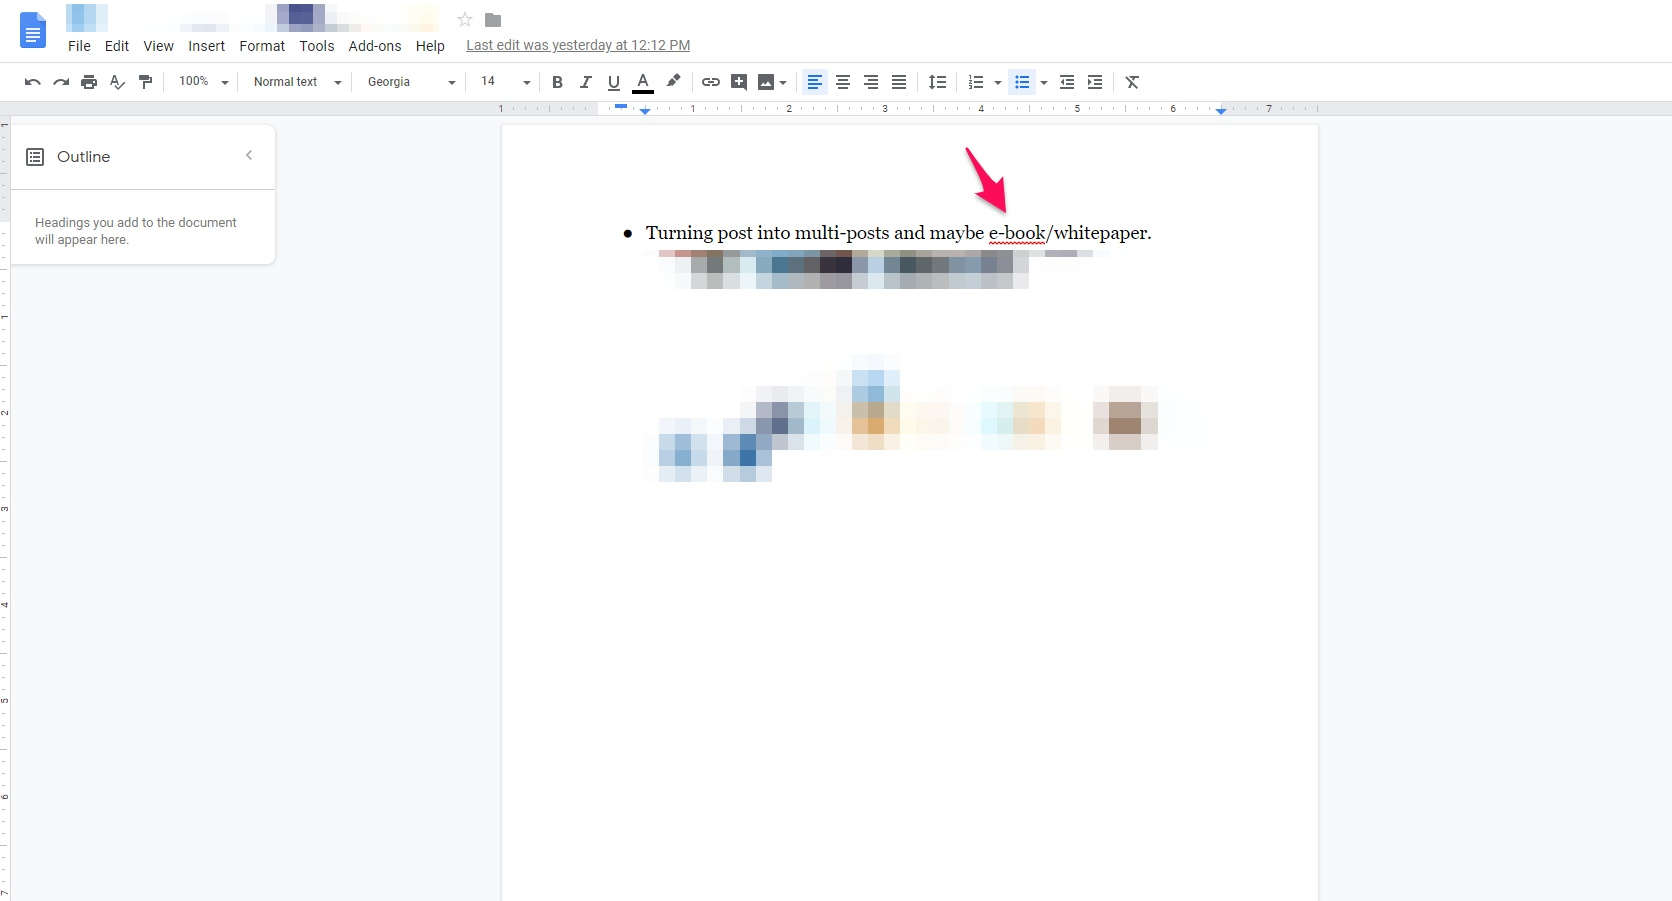 Grammar suggestion in Google Docs